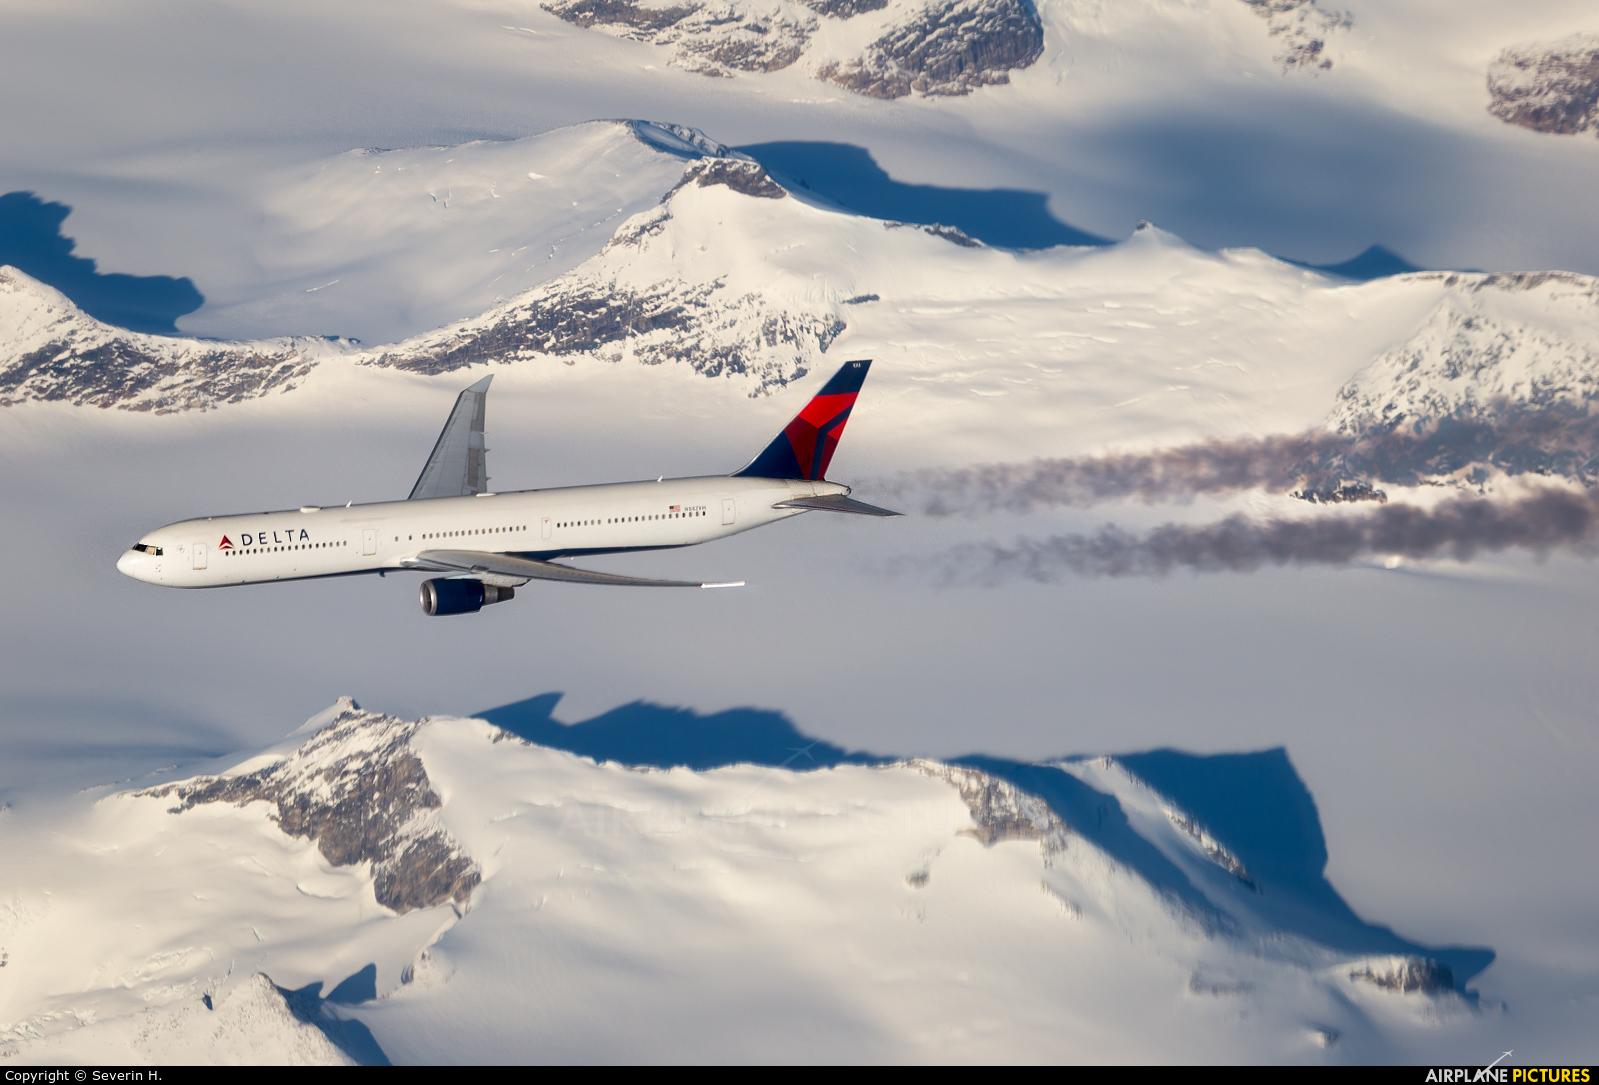 Delta Air Lines N842MH aircraft at In Flight - Greenland